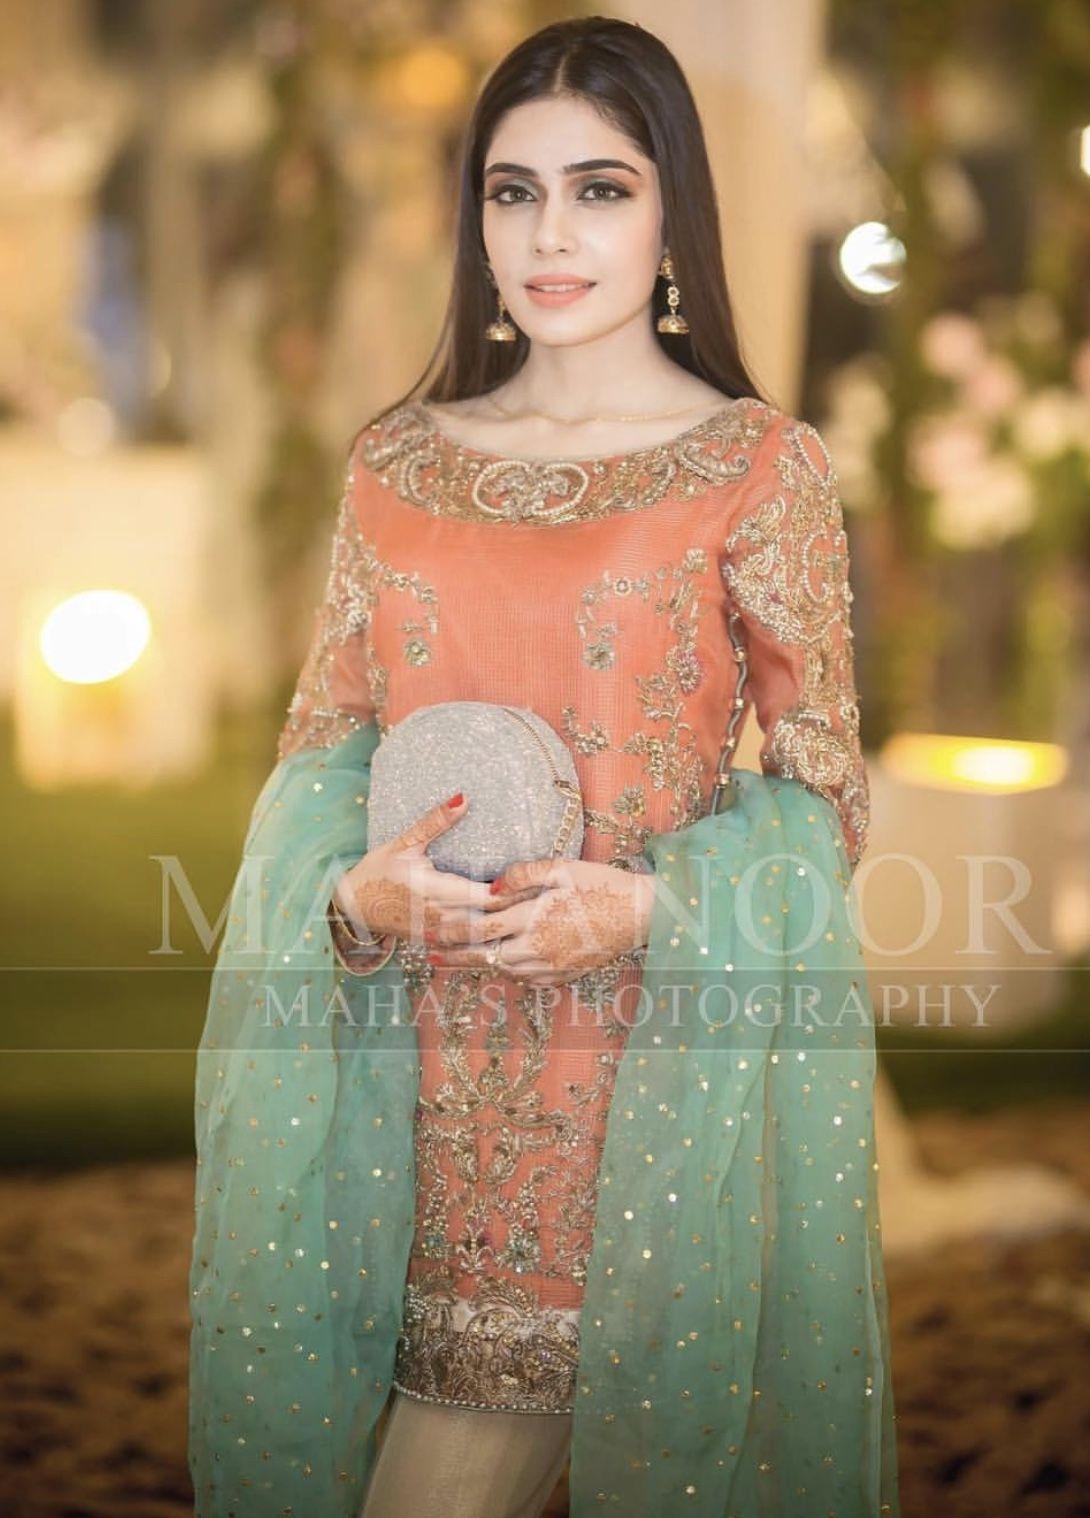 Grooms Sister Bridal Dresses Pakistan Wedding Dresses For Girls Pakistani Wedding Dresses,Slim Fit Casual Smart Casual Wedding Dresses For Men